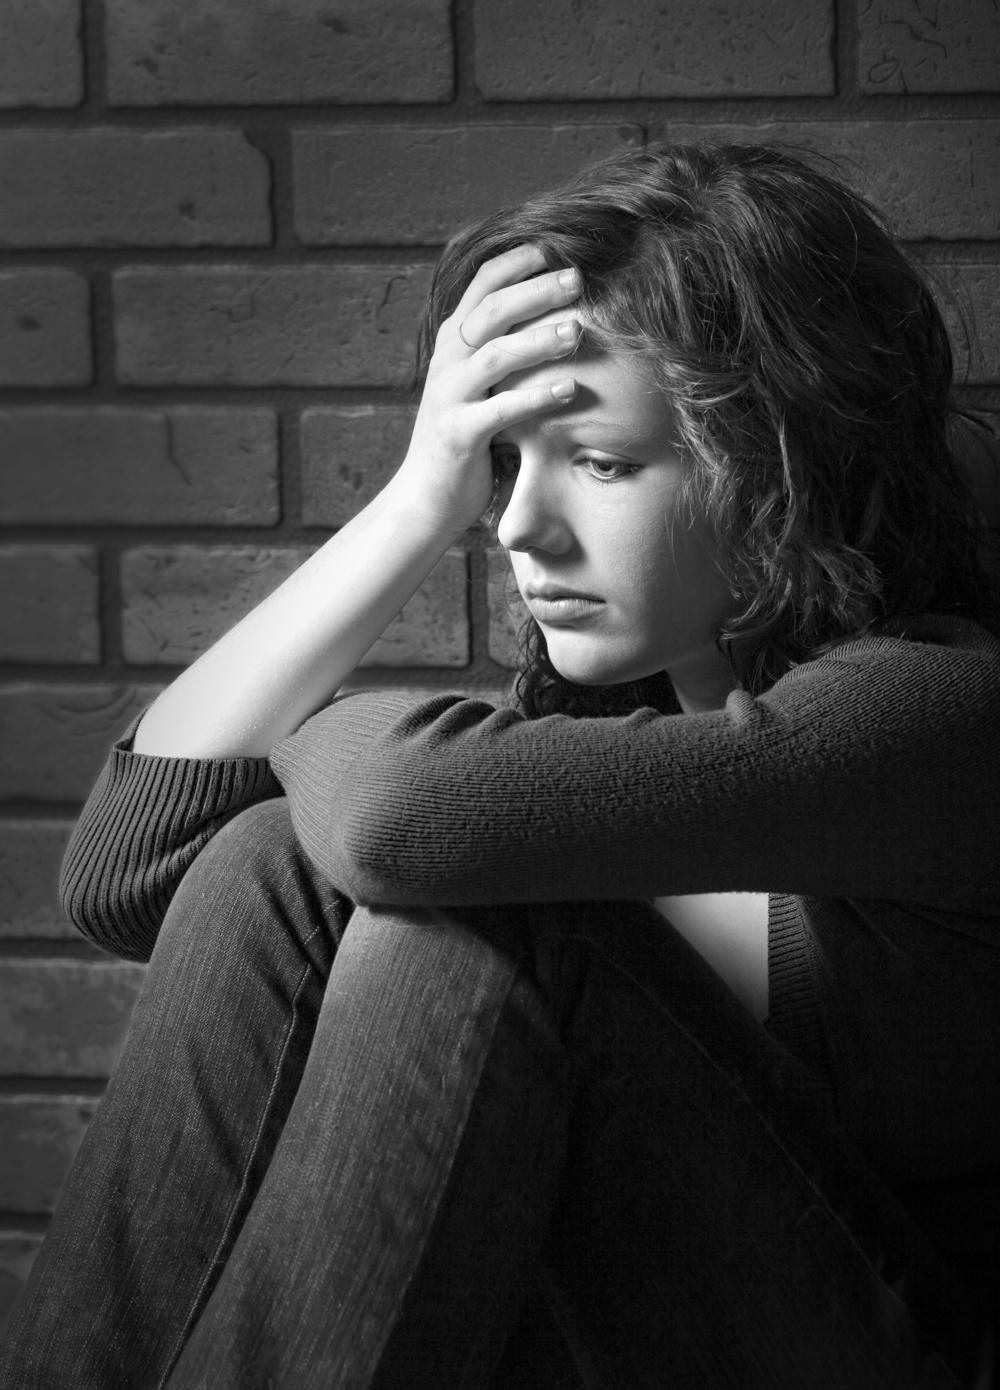 Girl Confused sad_3333682_Subscription_L.jpg